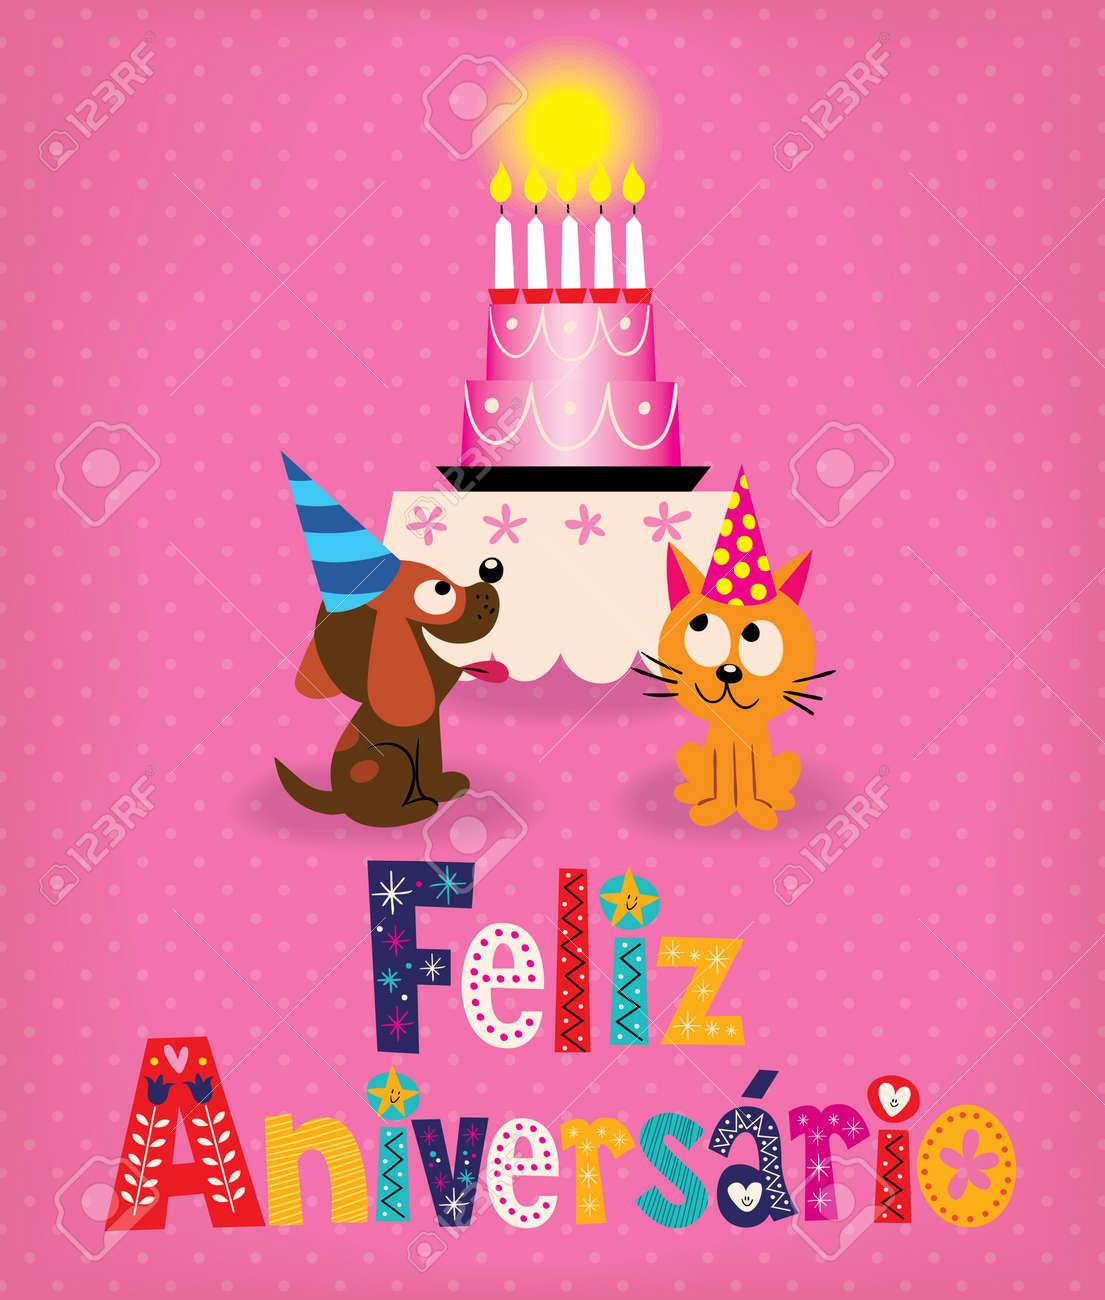 Feliz Aniversario Brazilian Portuguese Happy Birthday Retro Card – Portuguese Birthday Cards